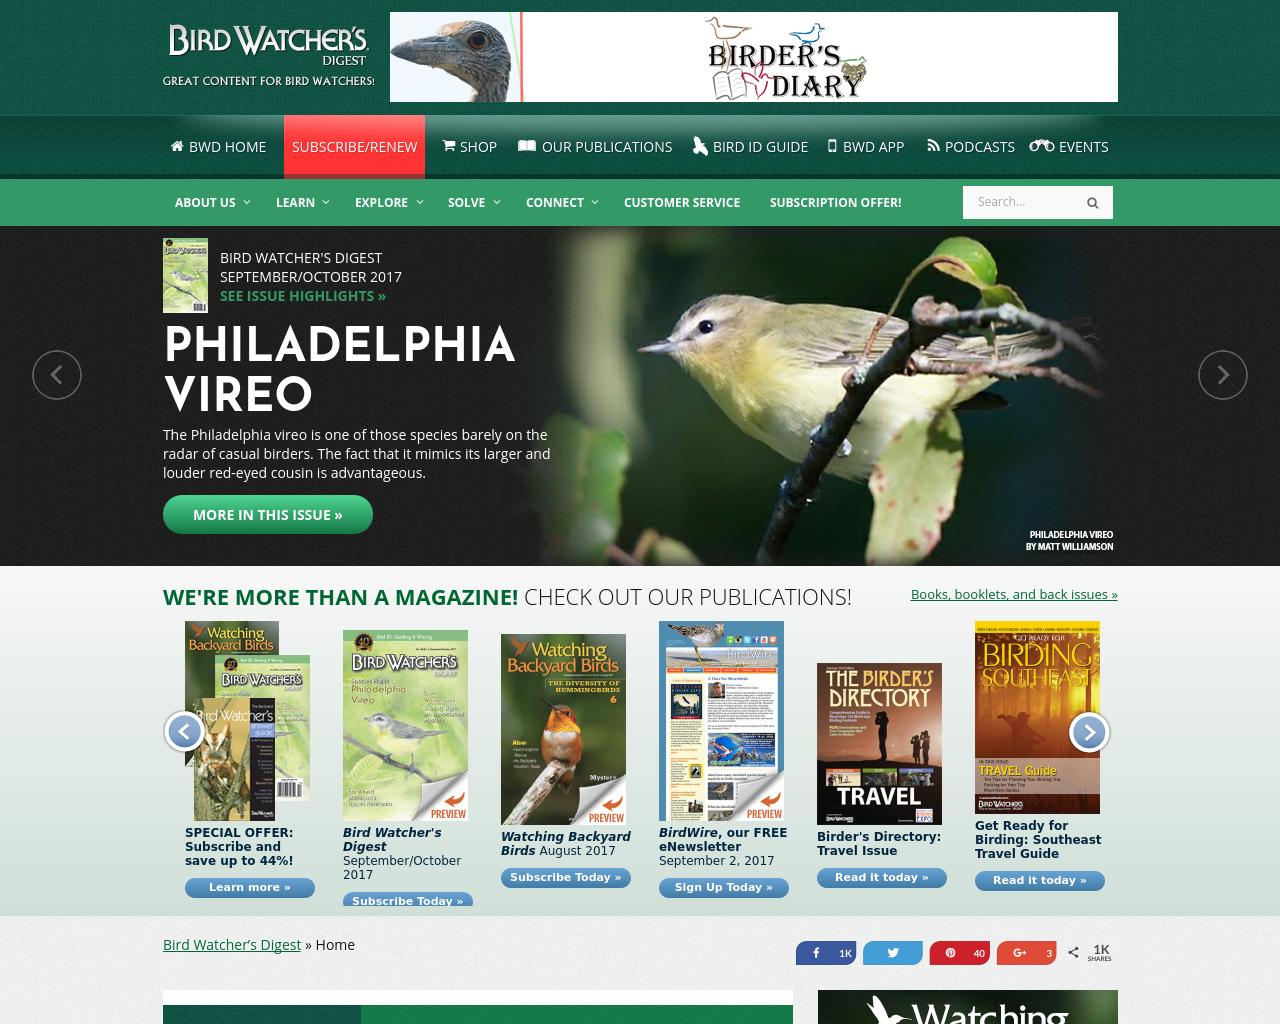 Bird-Watcher's-Digest-Advertising-Reviews-Pricing